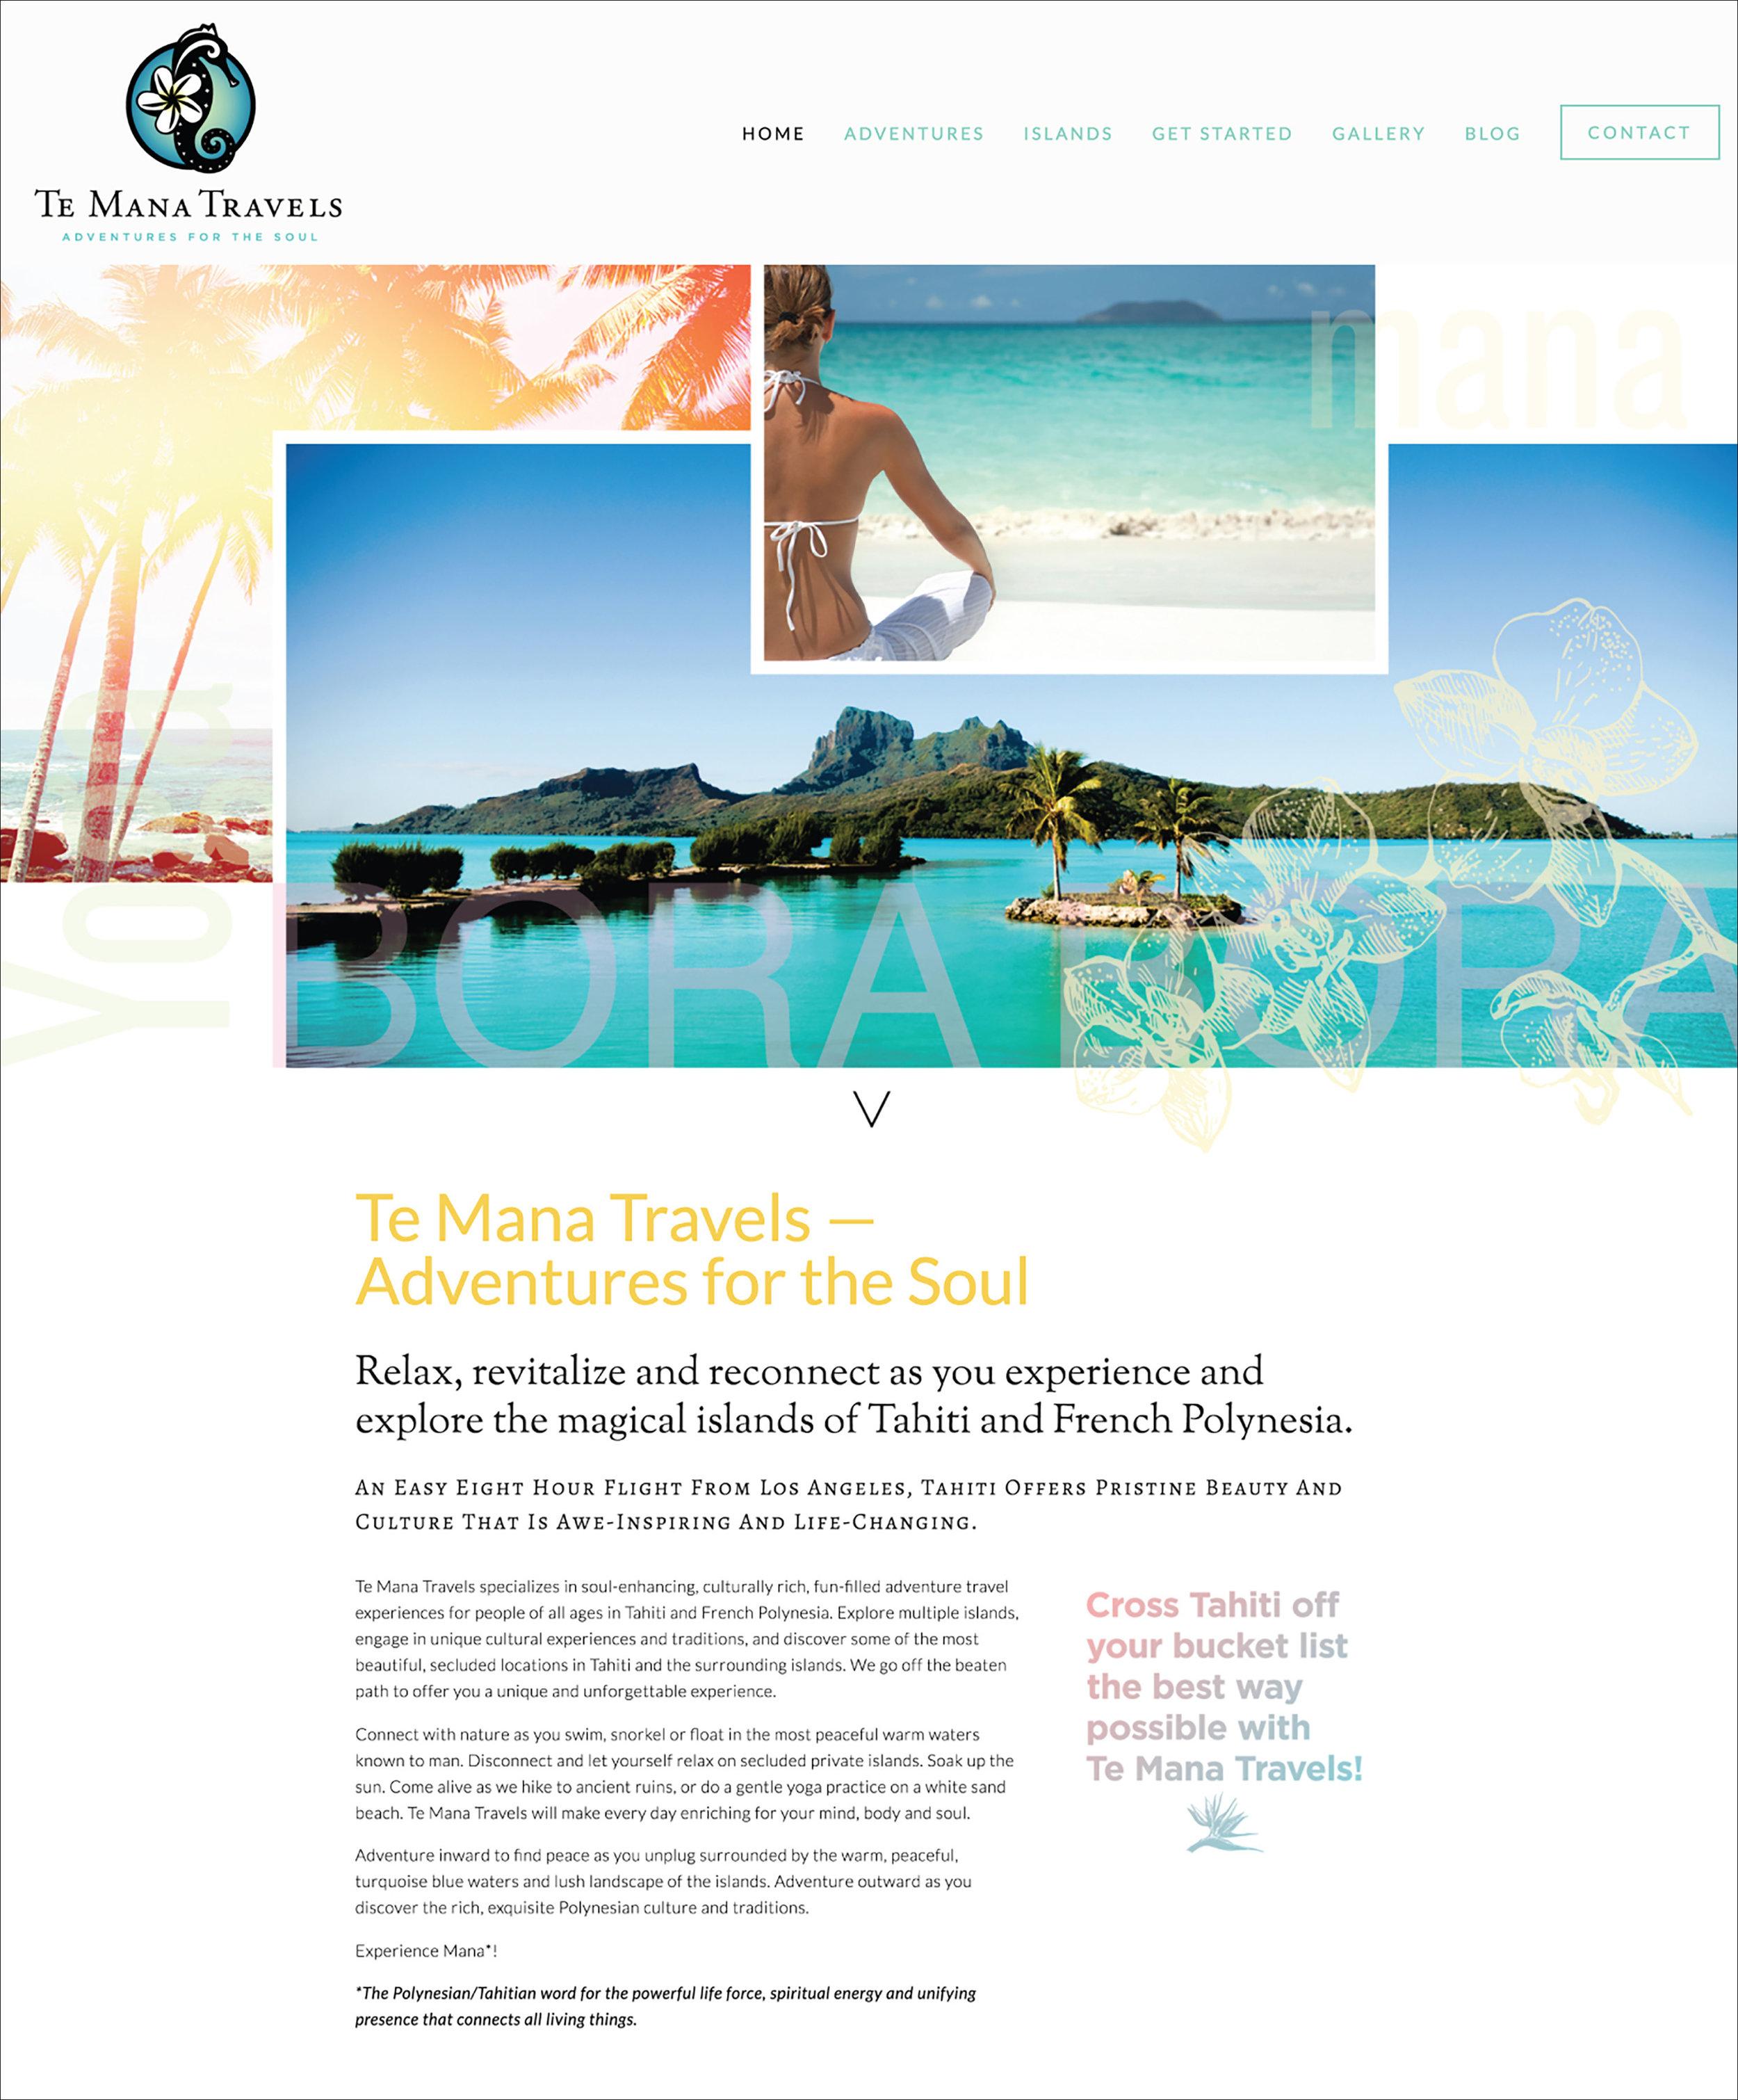 Te Mana Travels Website | Sailboat and yoga adventures to French Polynesia, Tahiti | DesignCode | Austin, Texas